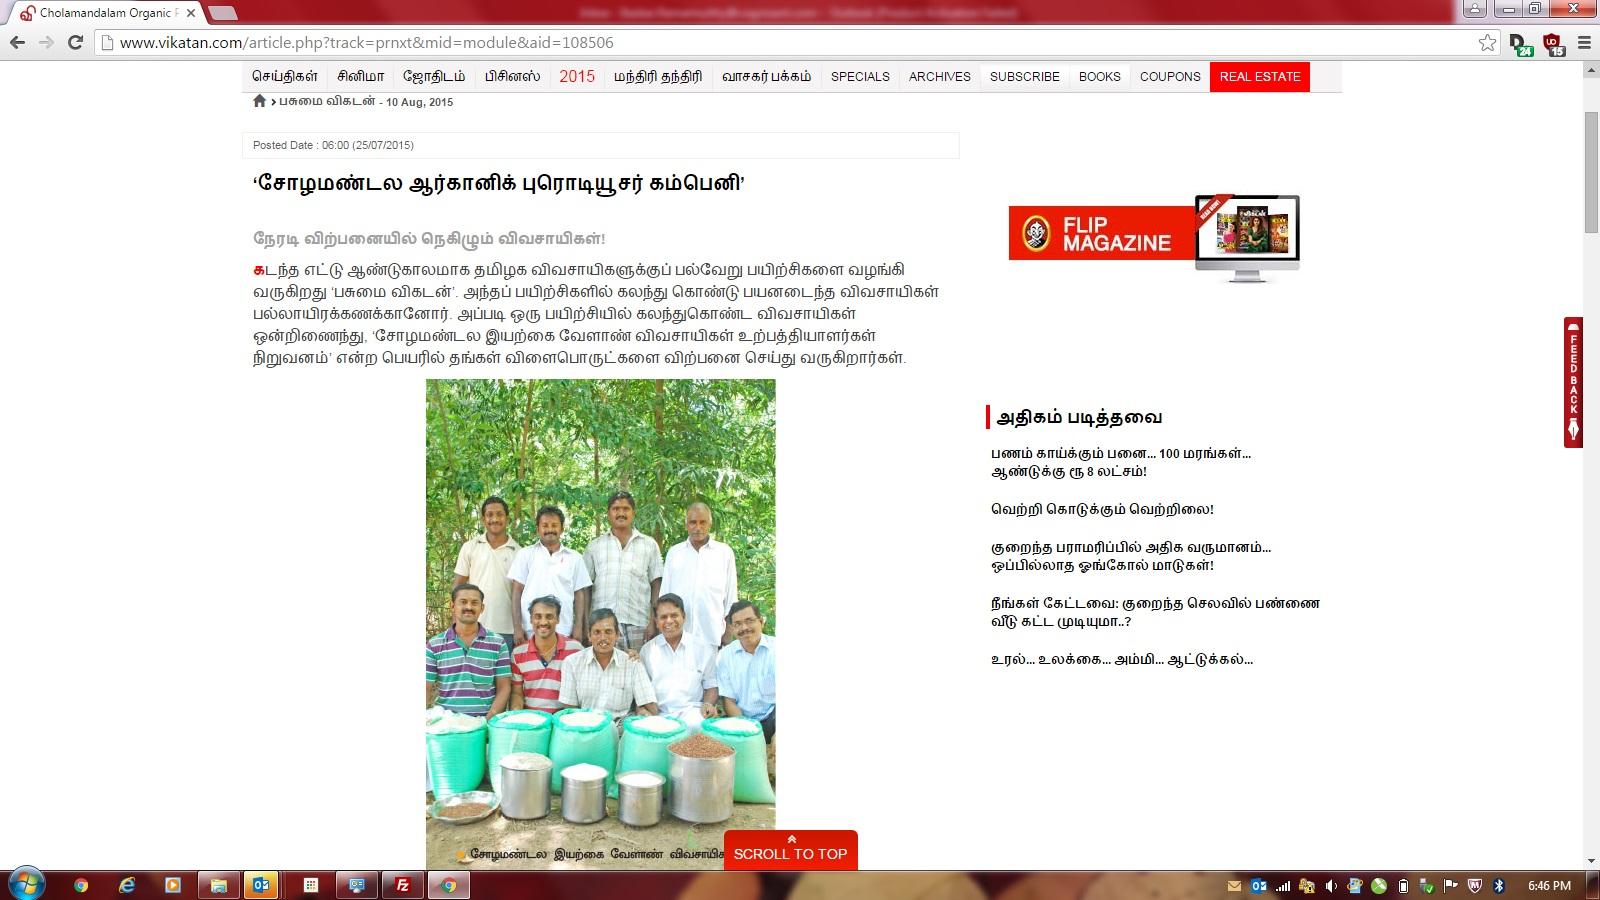 Srirm & Muthu covered in Cholamangal Organic Producer company coverage by Pasumai Vikatan